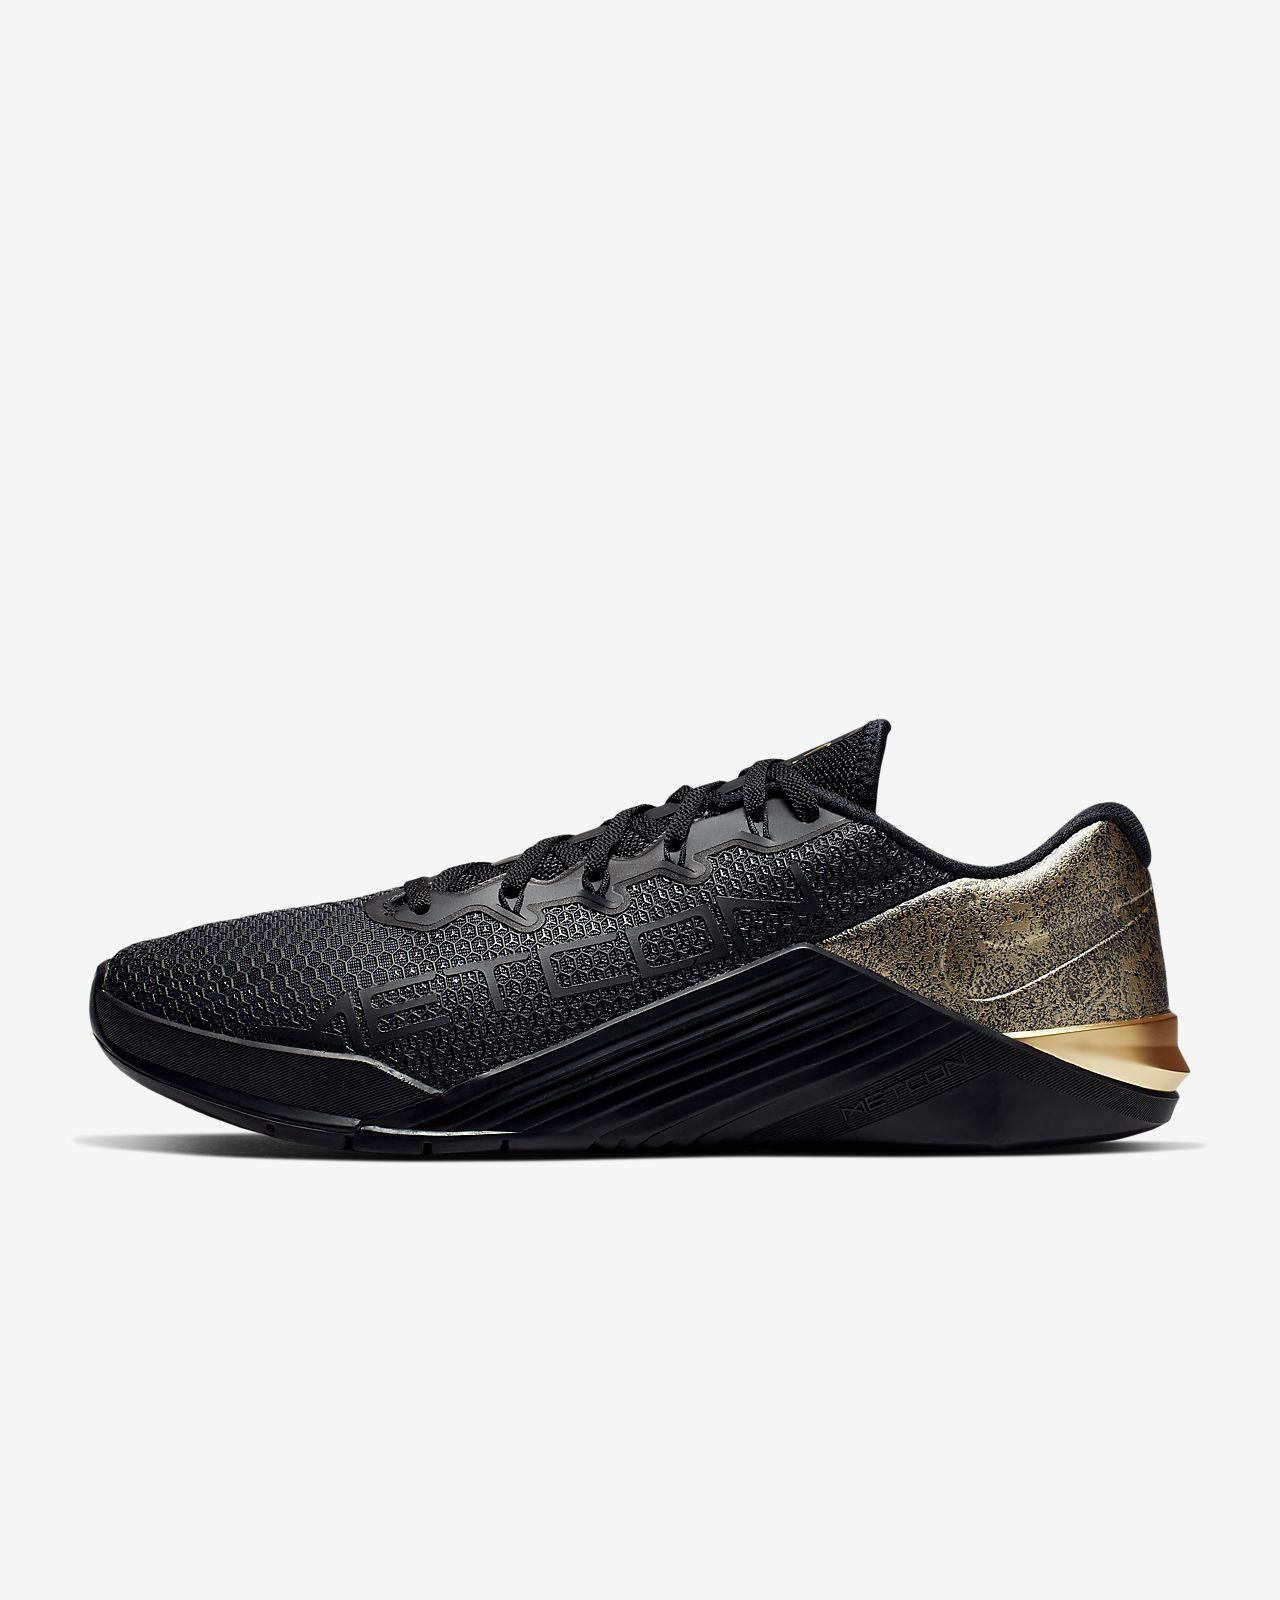 Chaussure de training Nike Metcon 5 Black x Gold